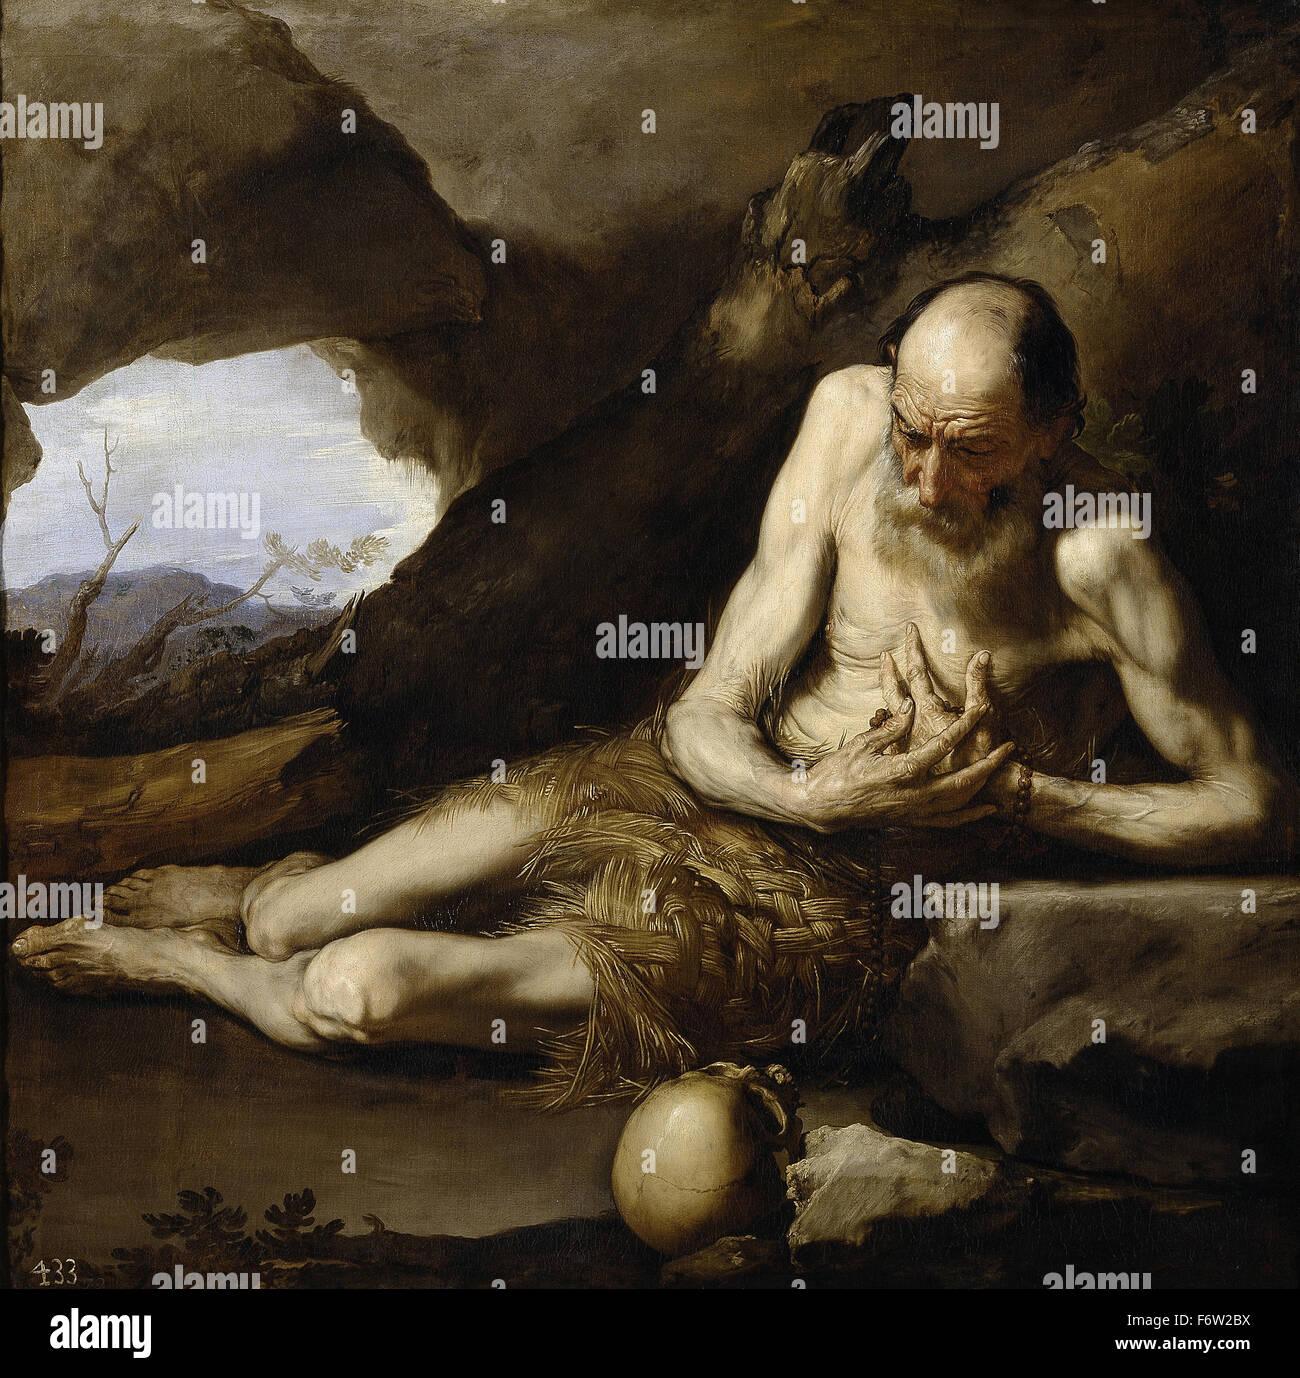 Jusepe de Ribera - Saint Paul the Hermit - Stock Image